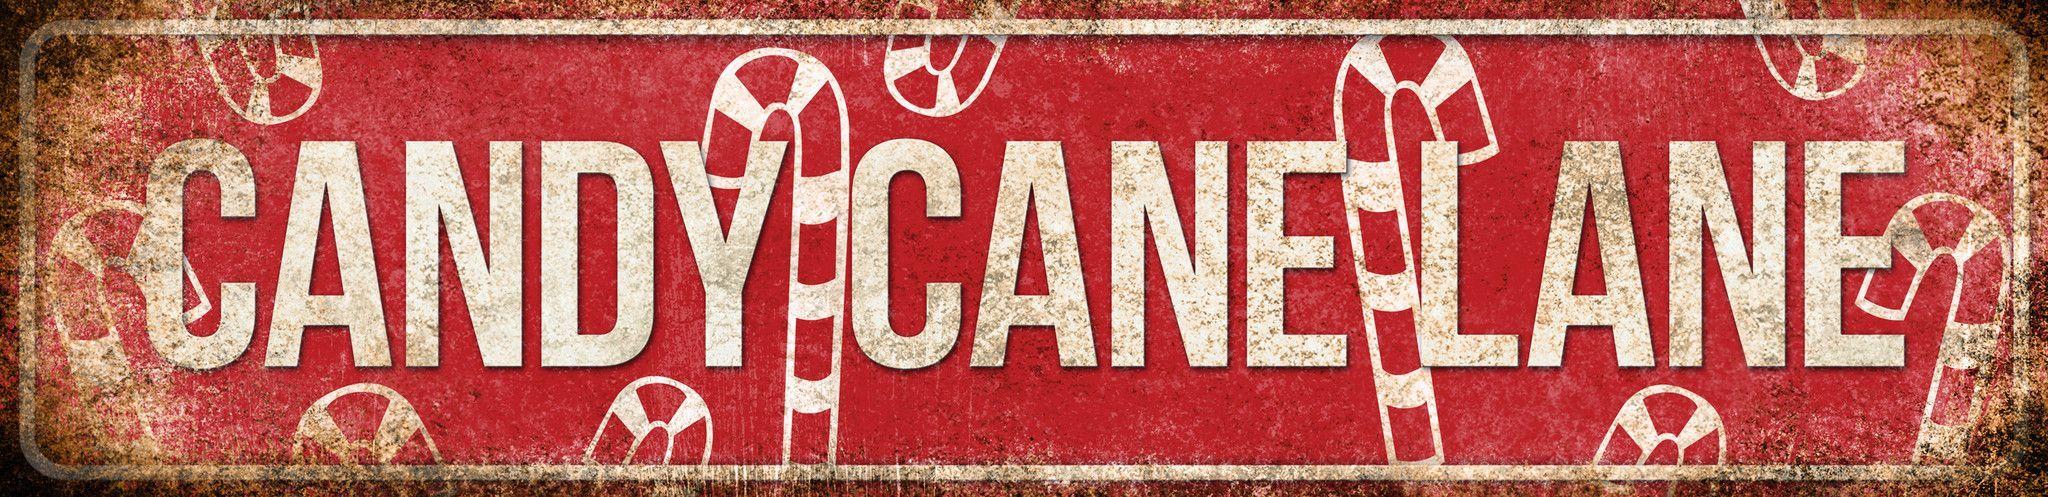 "Candy Cane Lane // 1 Metal Sign // 5.5"" x 22"" Mantel"